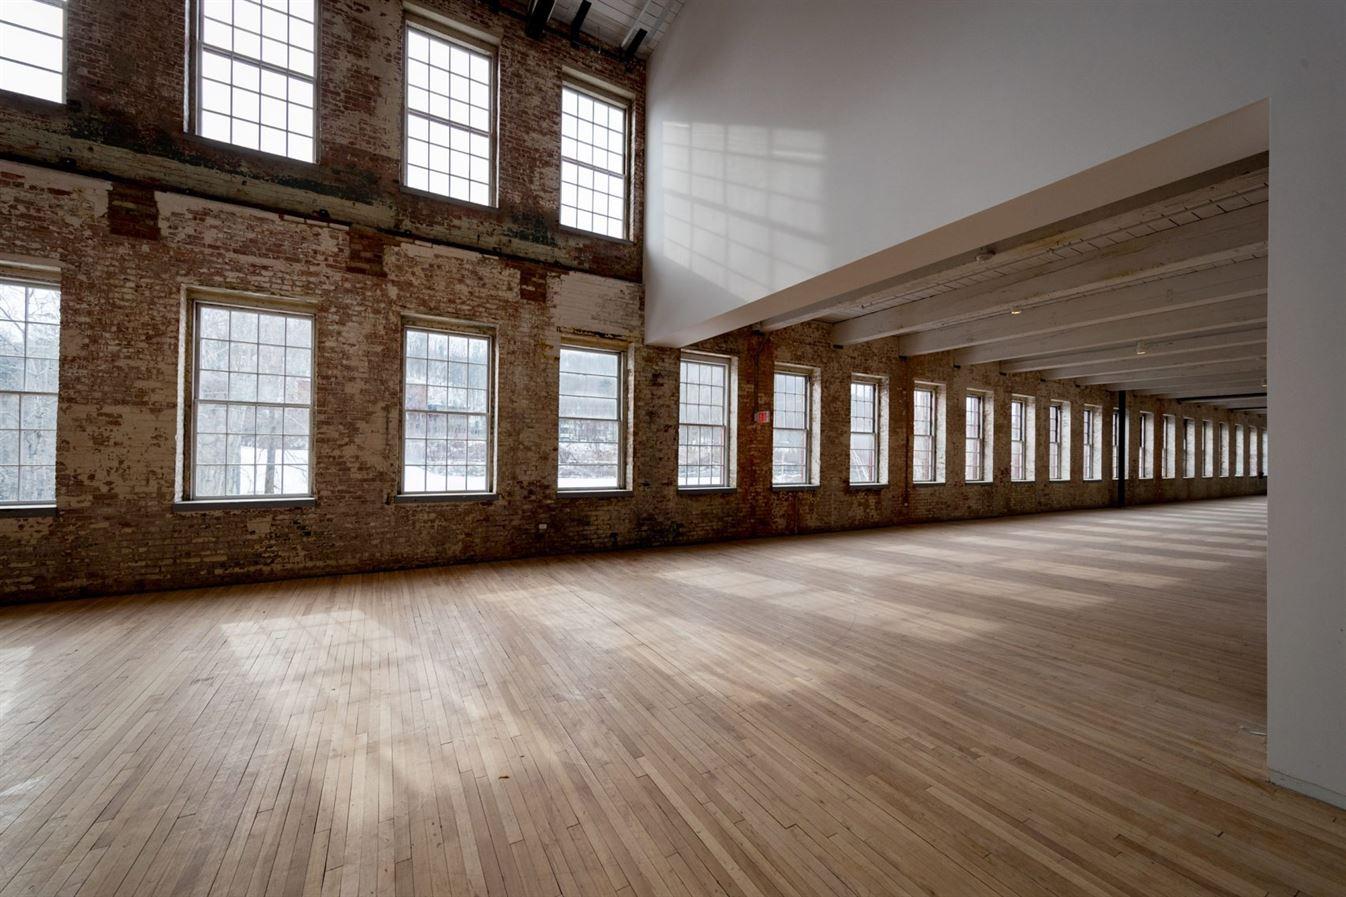 bruner-cott-mass-moca-massachusetts-museum-of-contemporary-art-museum-textile-factory-berkshires-expansi8888on-renovation_dezeen_3-1704